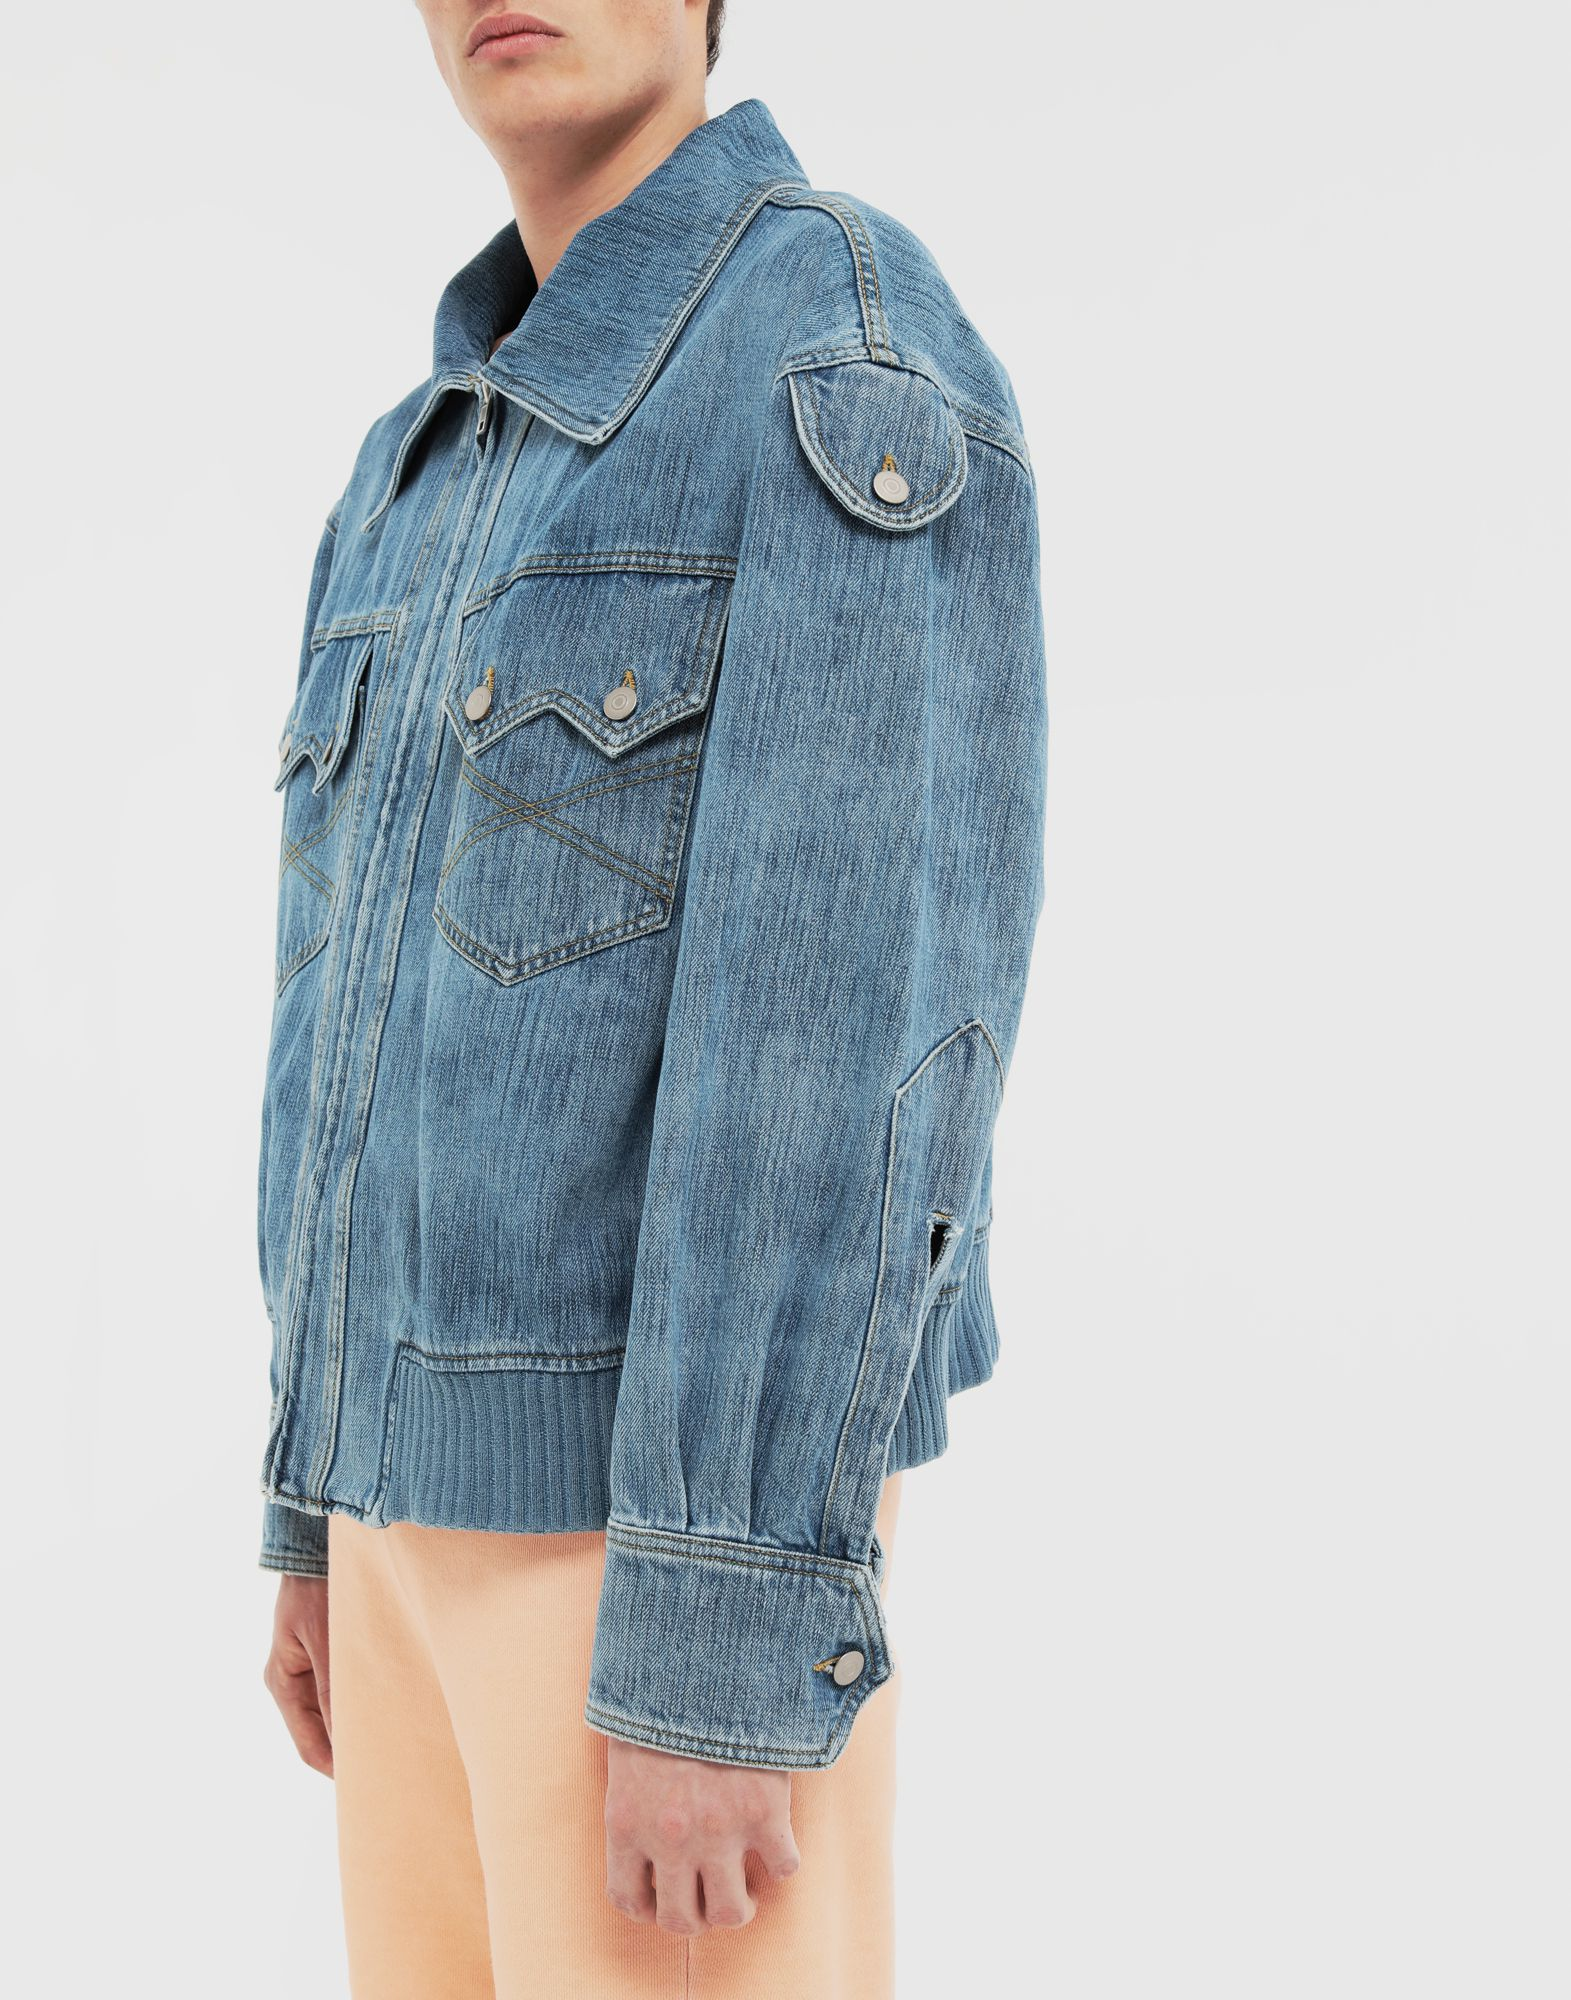 MAISON MARGIELA Bleached indigo denim sports jacket Coats and Trenches Man a